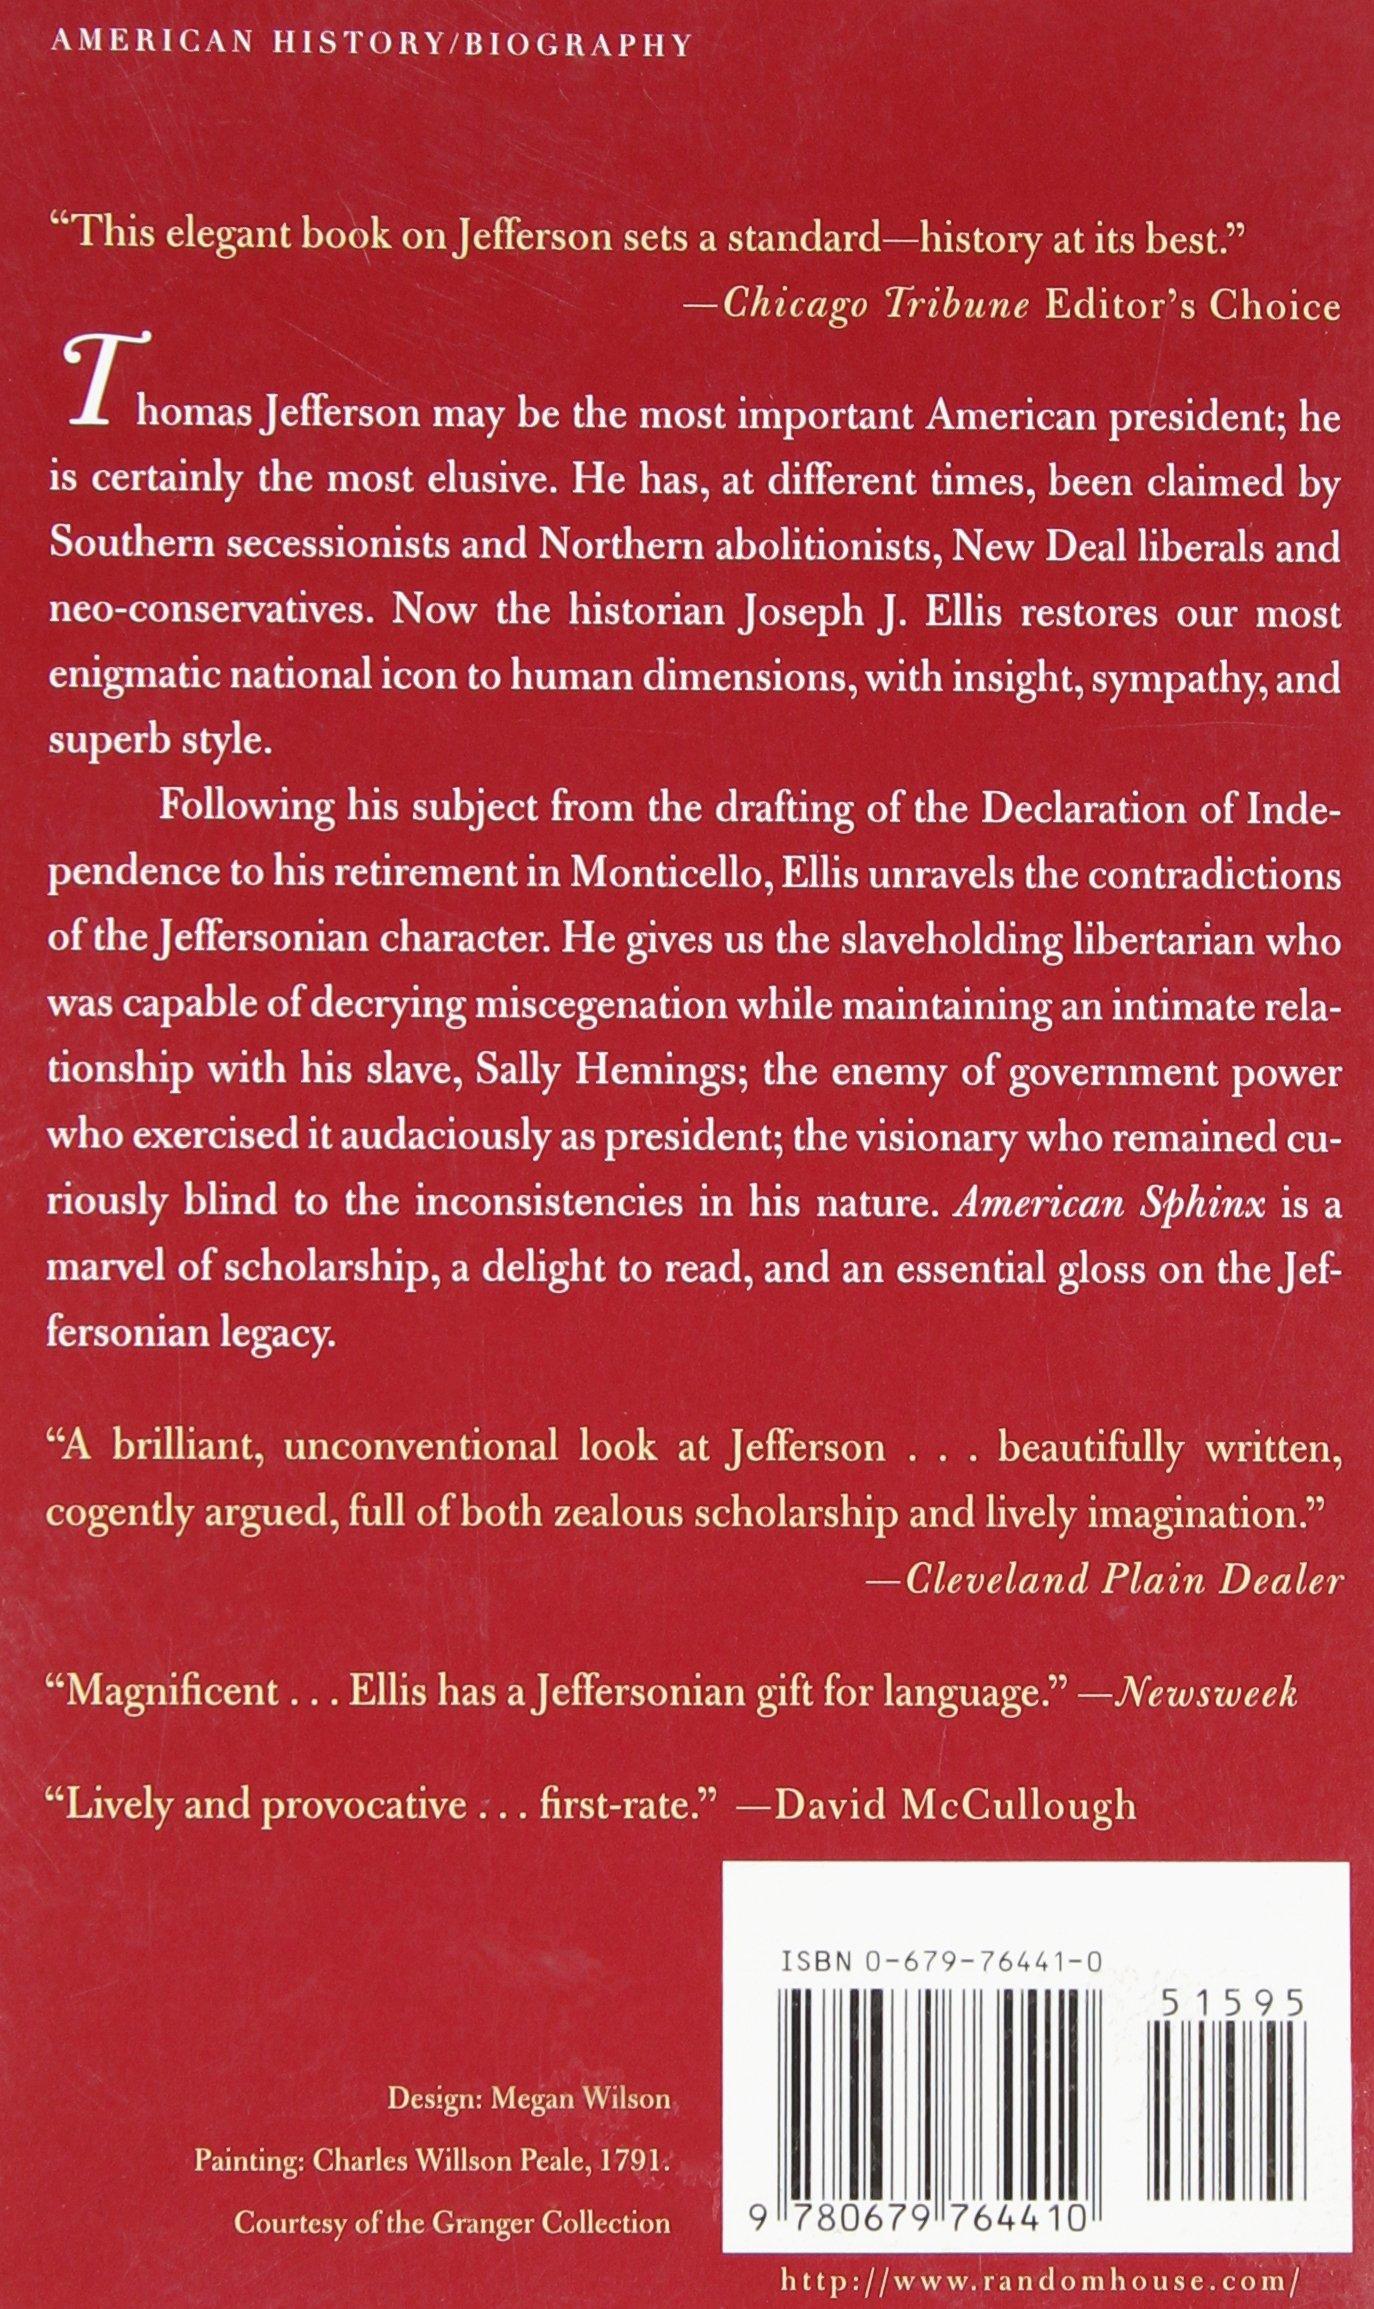 Amazon: American Sphinx: The Character Of Thomas Jefferson  (9780679764410): Joseph J Ellis: Books